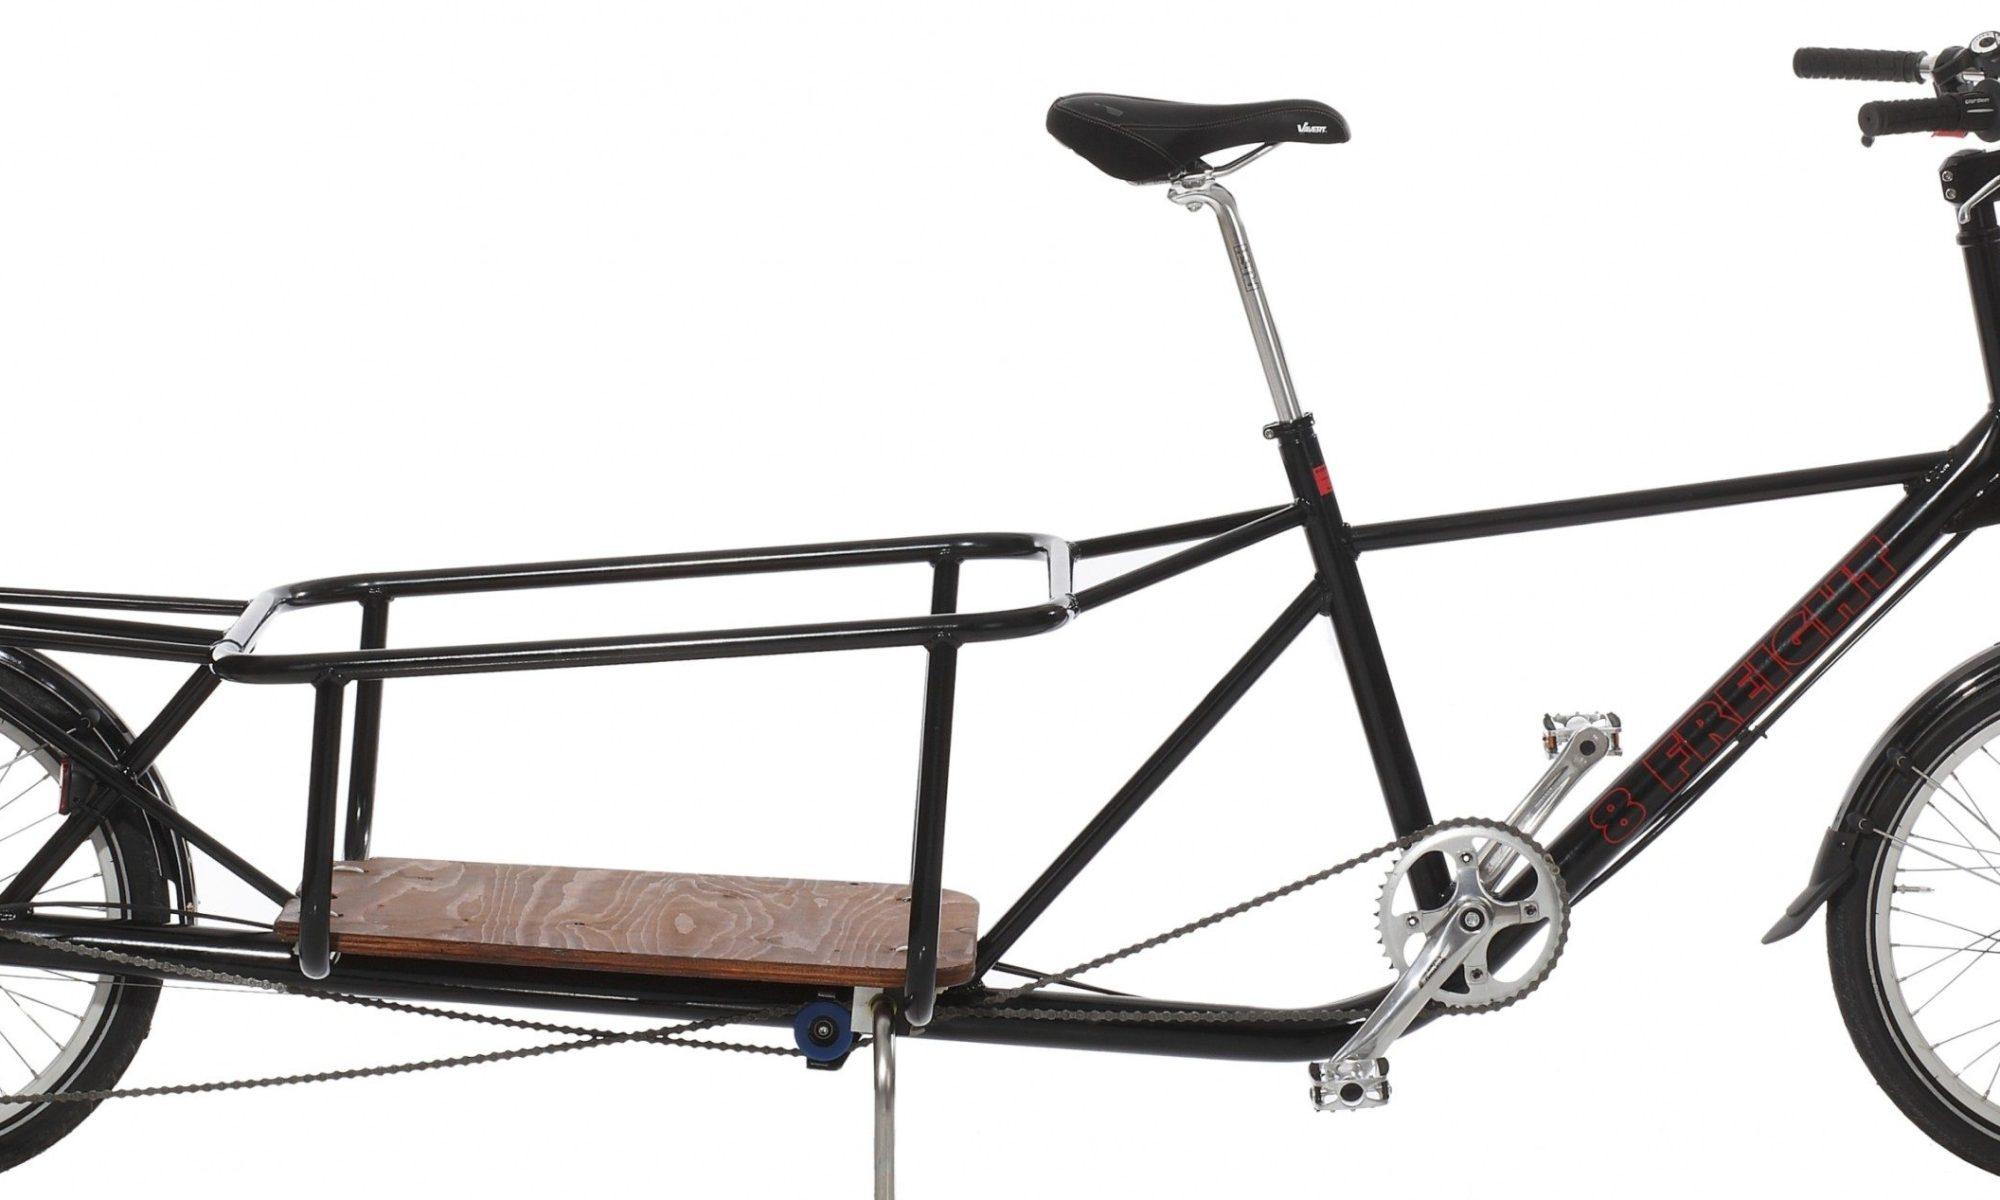 8Freight Cargo Bike